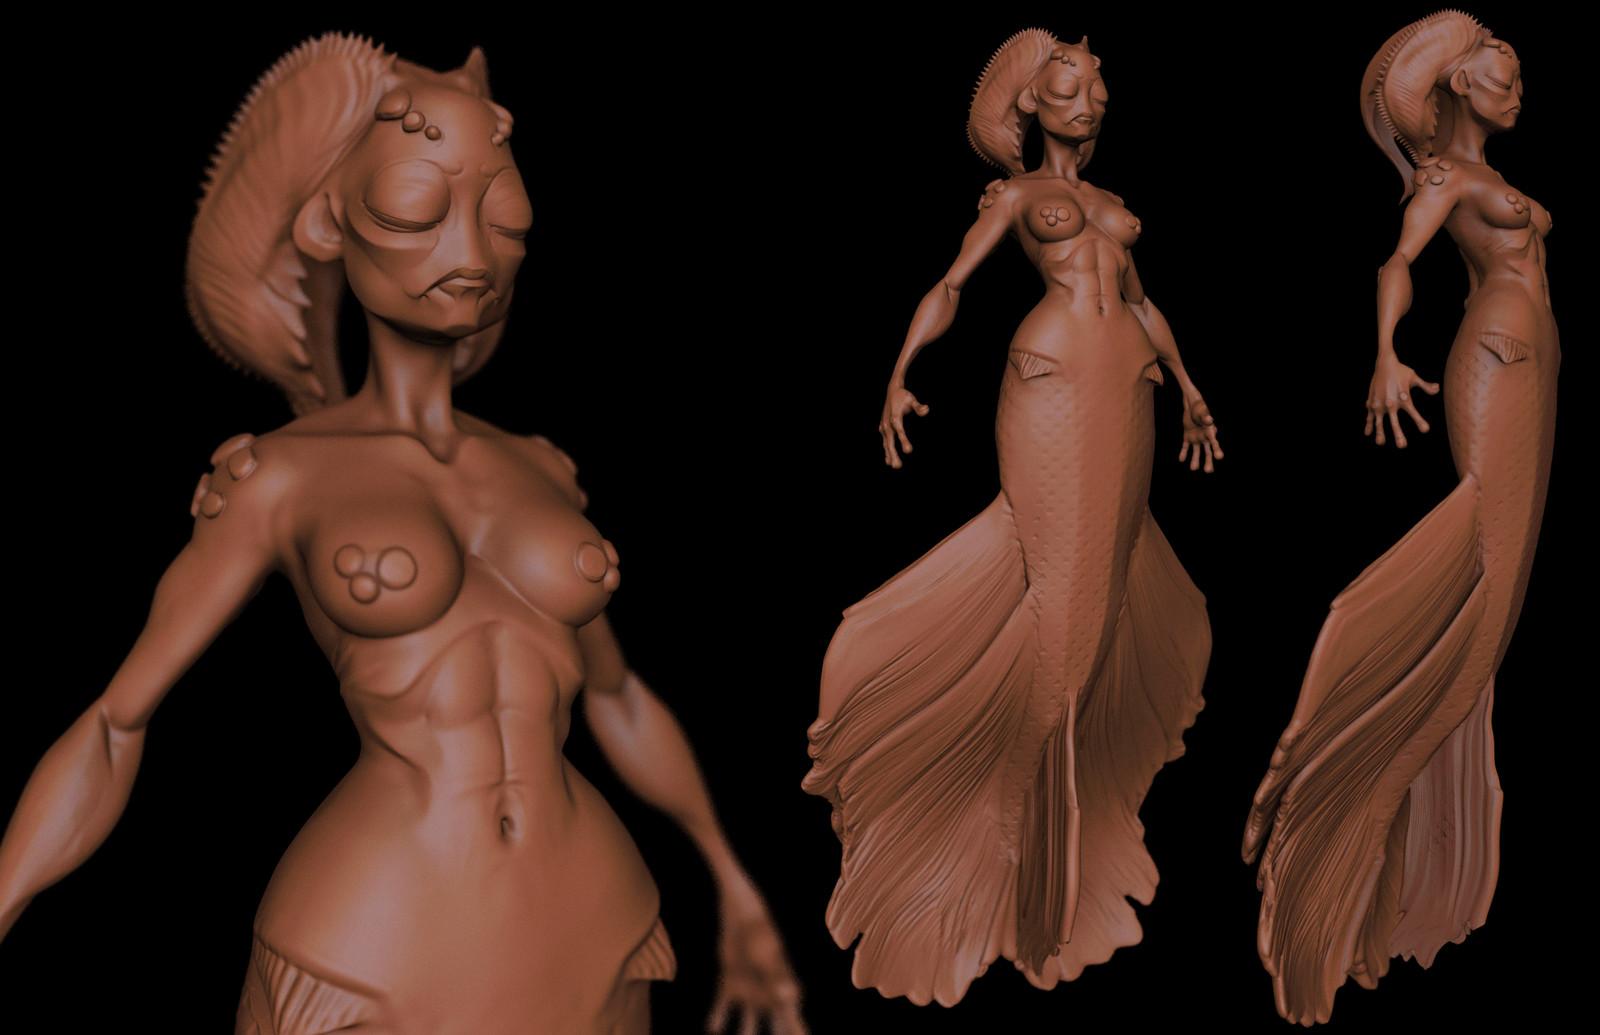 stylized mermaid doodle WIP